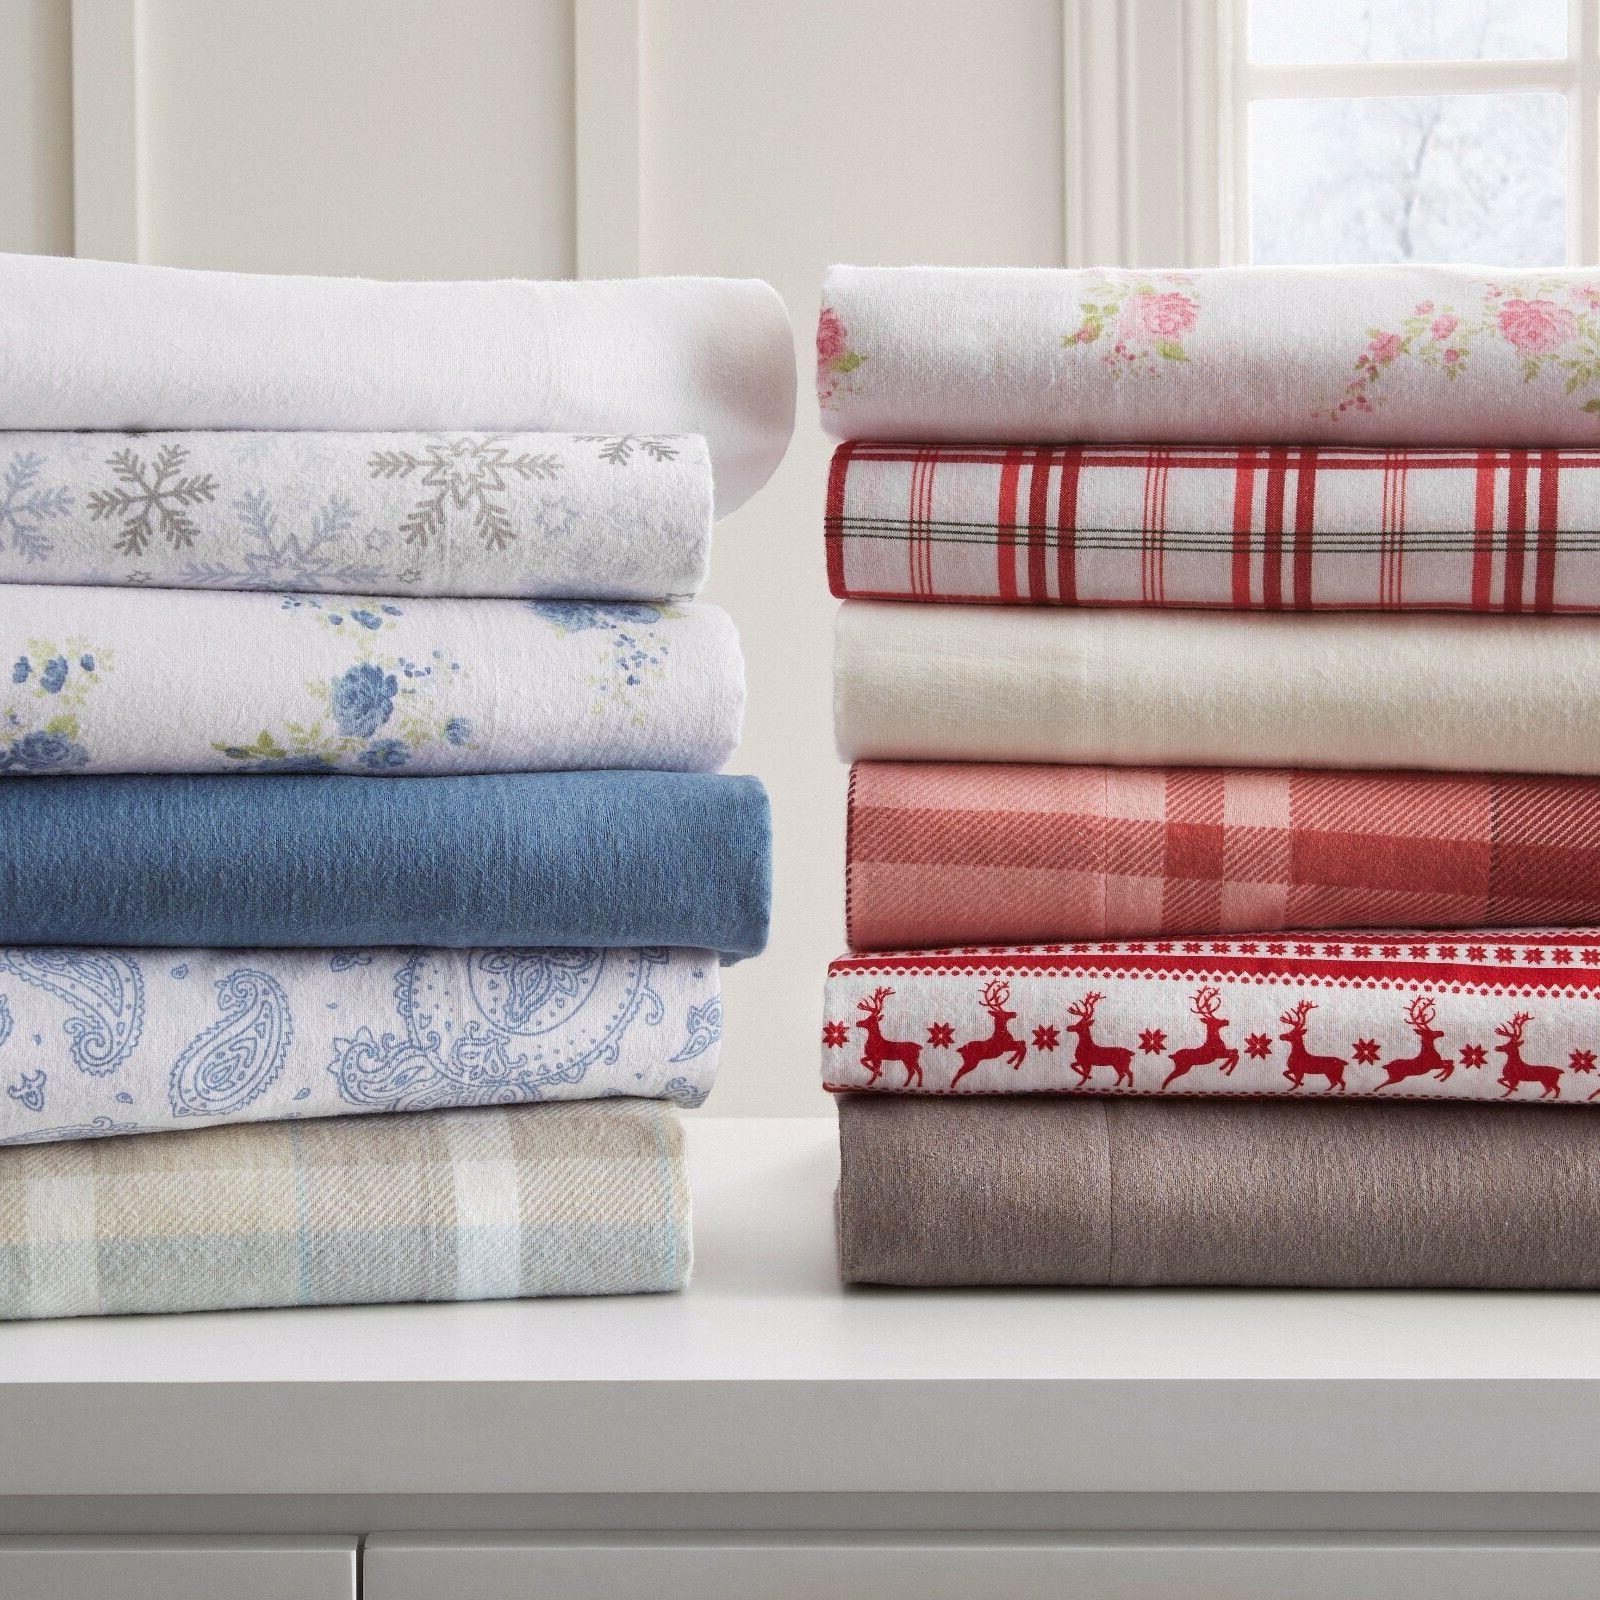 Ultra Soft Premium All-Season 4 Piece Flannel Bed Sheet Set